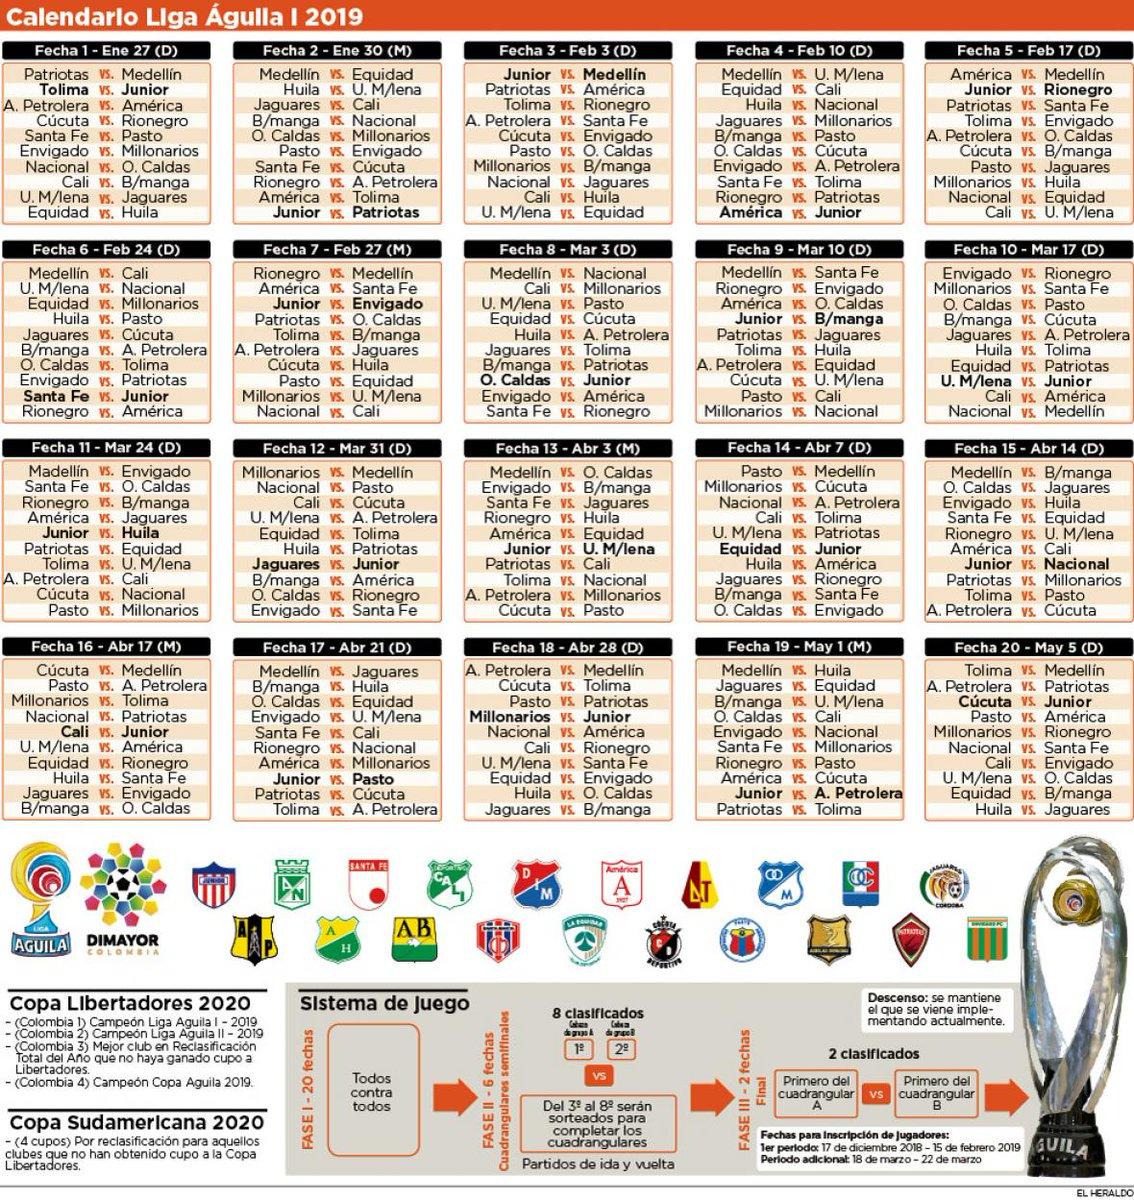 Calendario La Liga 2019.Deporteseh On Twitter Calendario Completo De La Liga Aguila I 2019